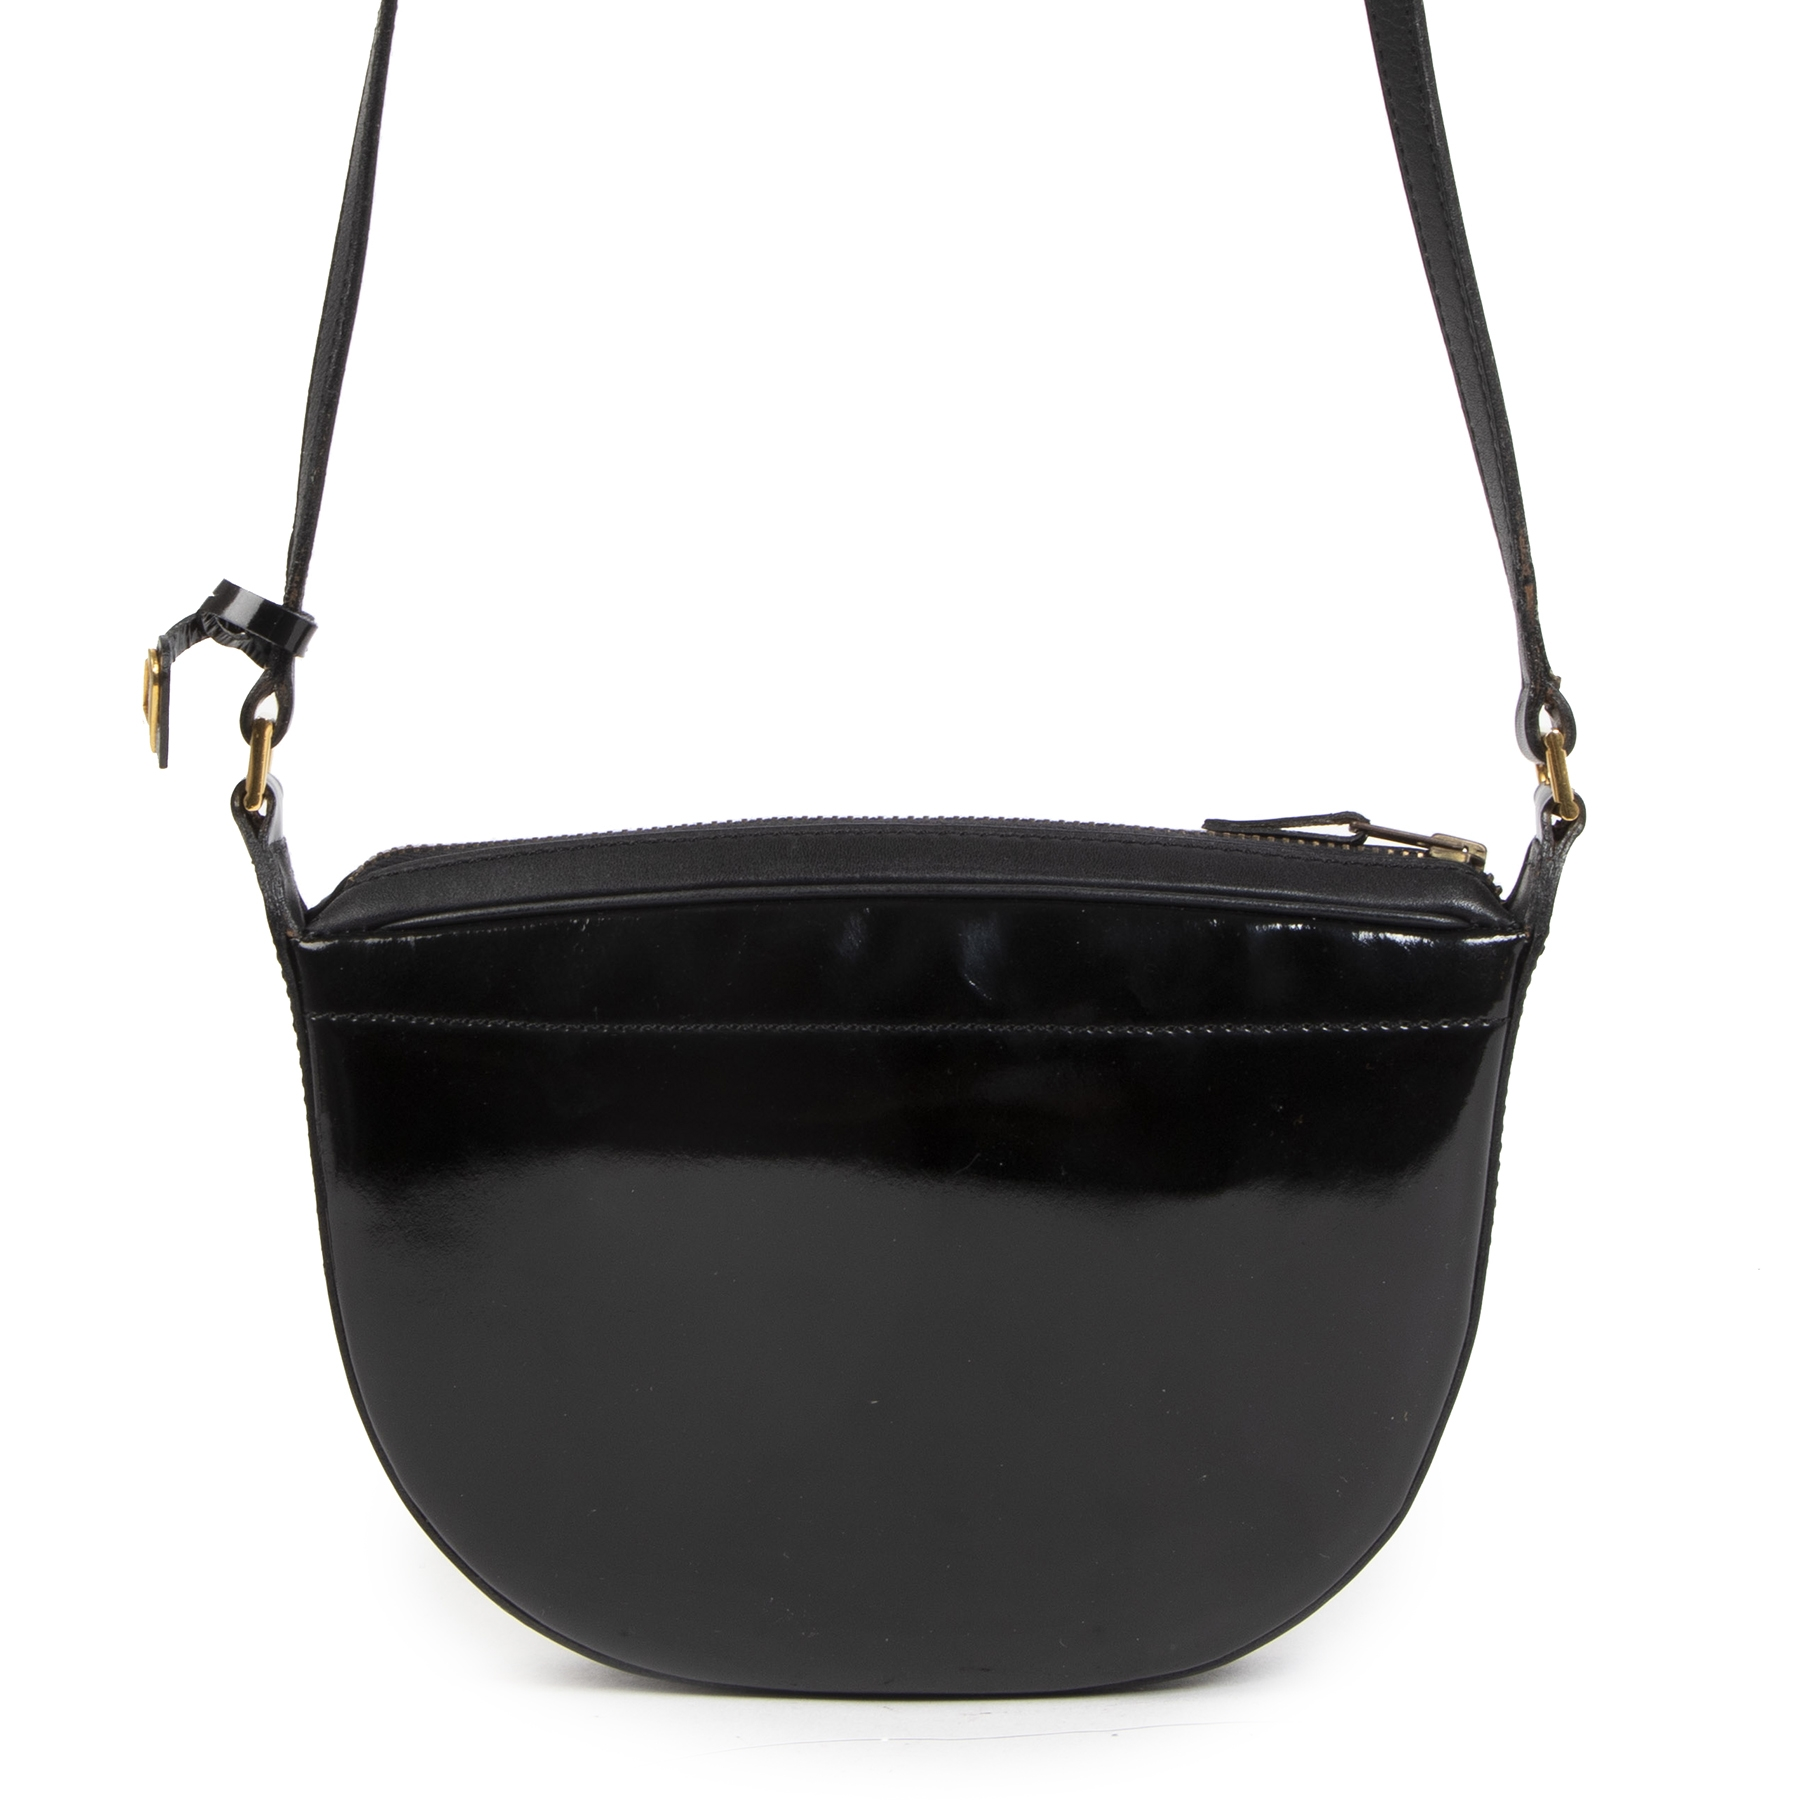 Authentieke tweedehands vintage Delvaux Black Patent Leather Crossbody Bag koop online webshop labelLOV